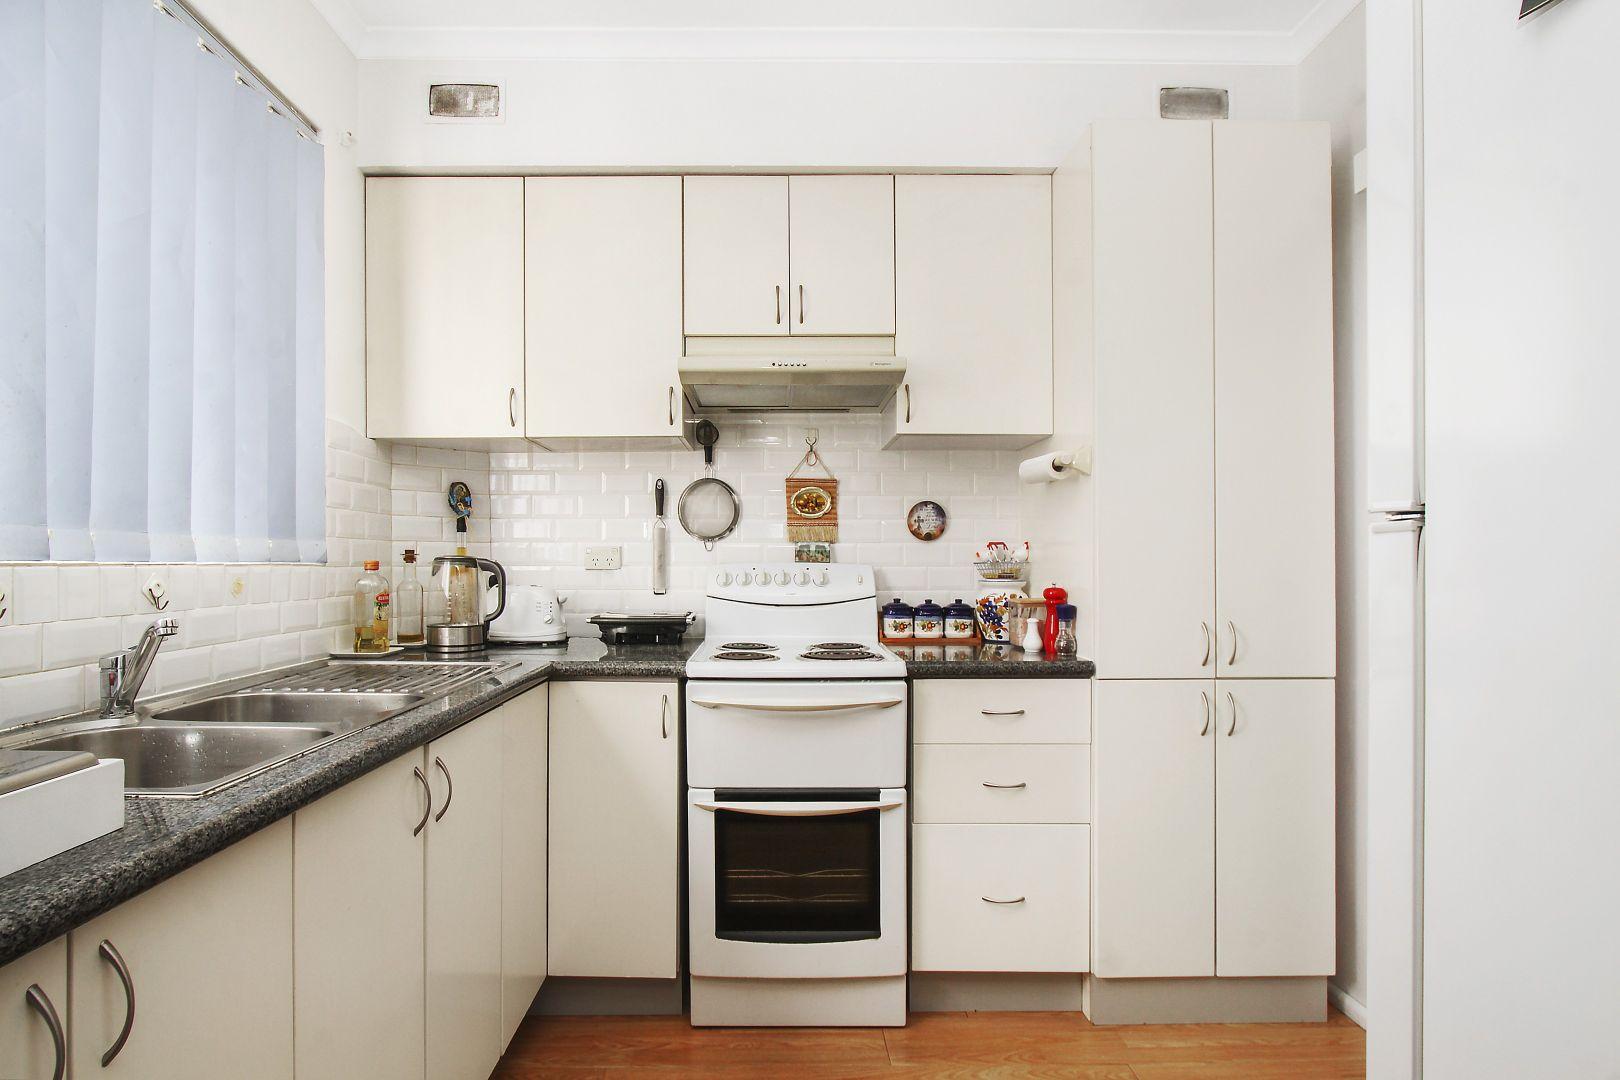 35/35-39 York Street, Fairfield NSW 2165, Image 2